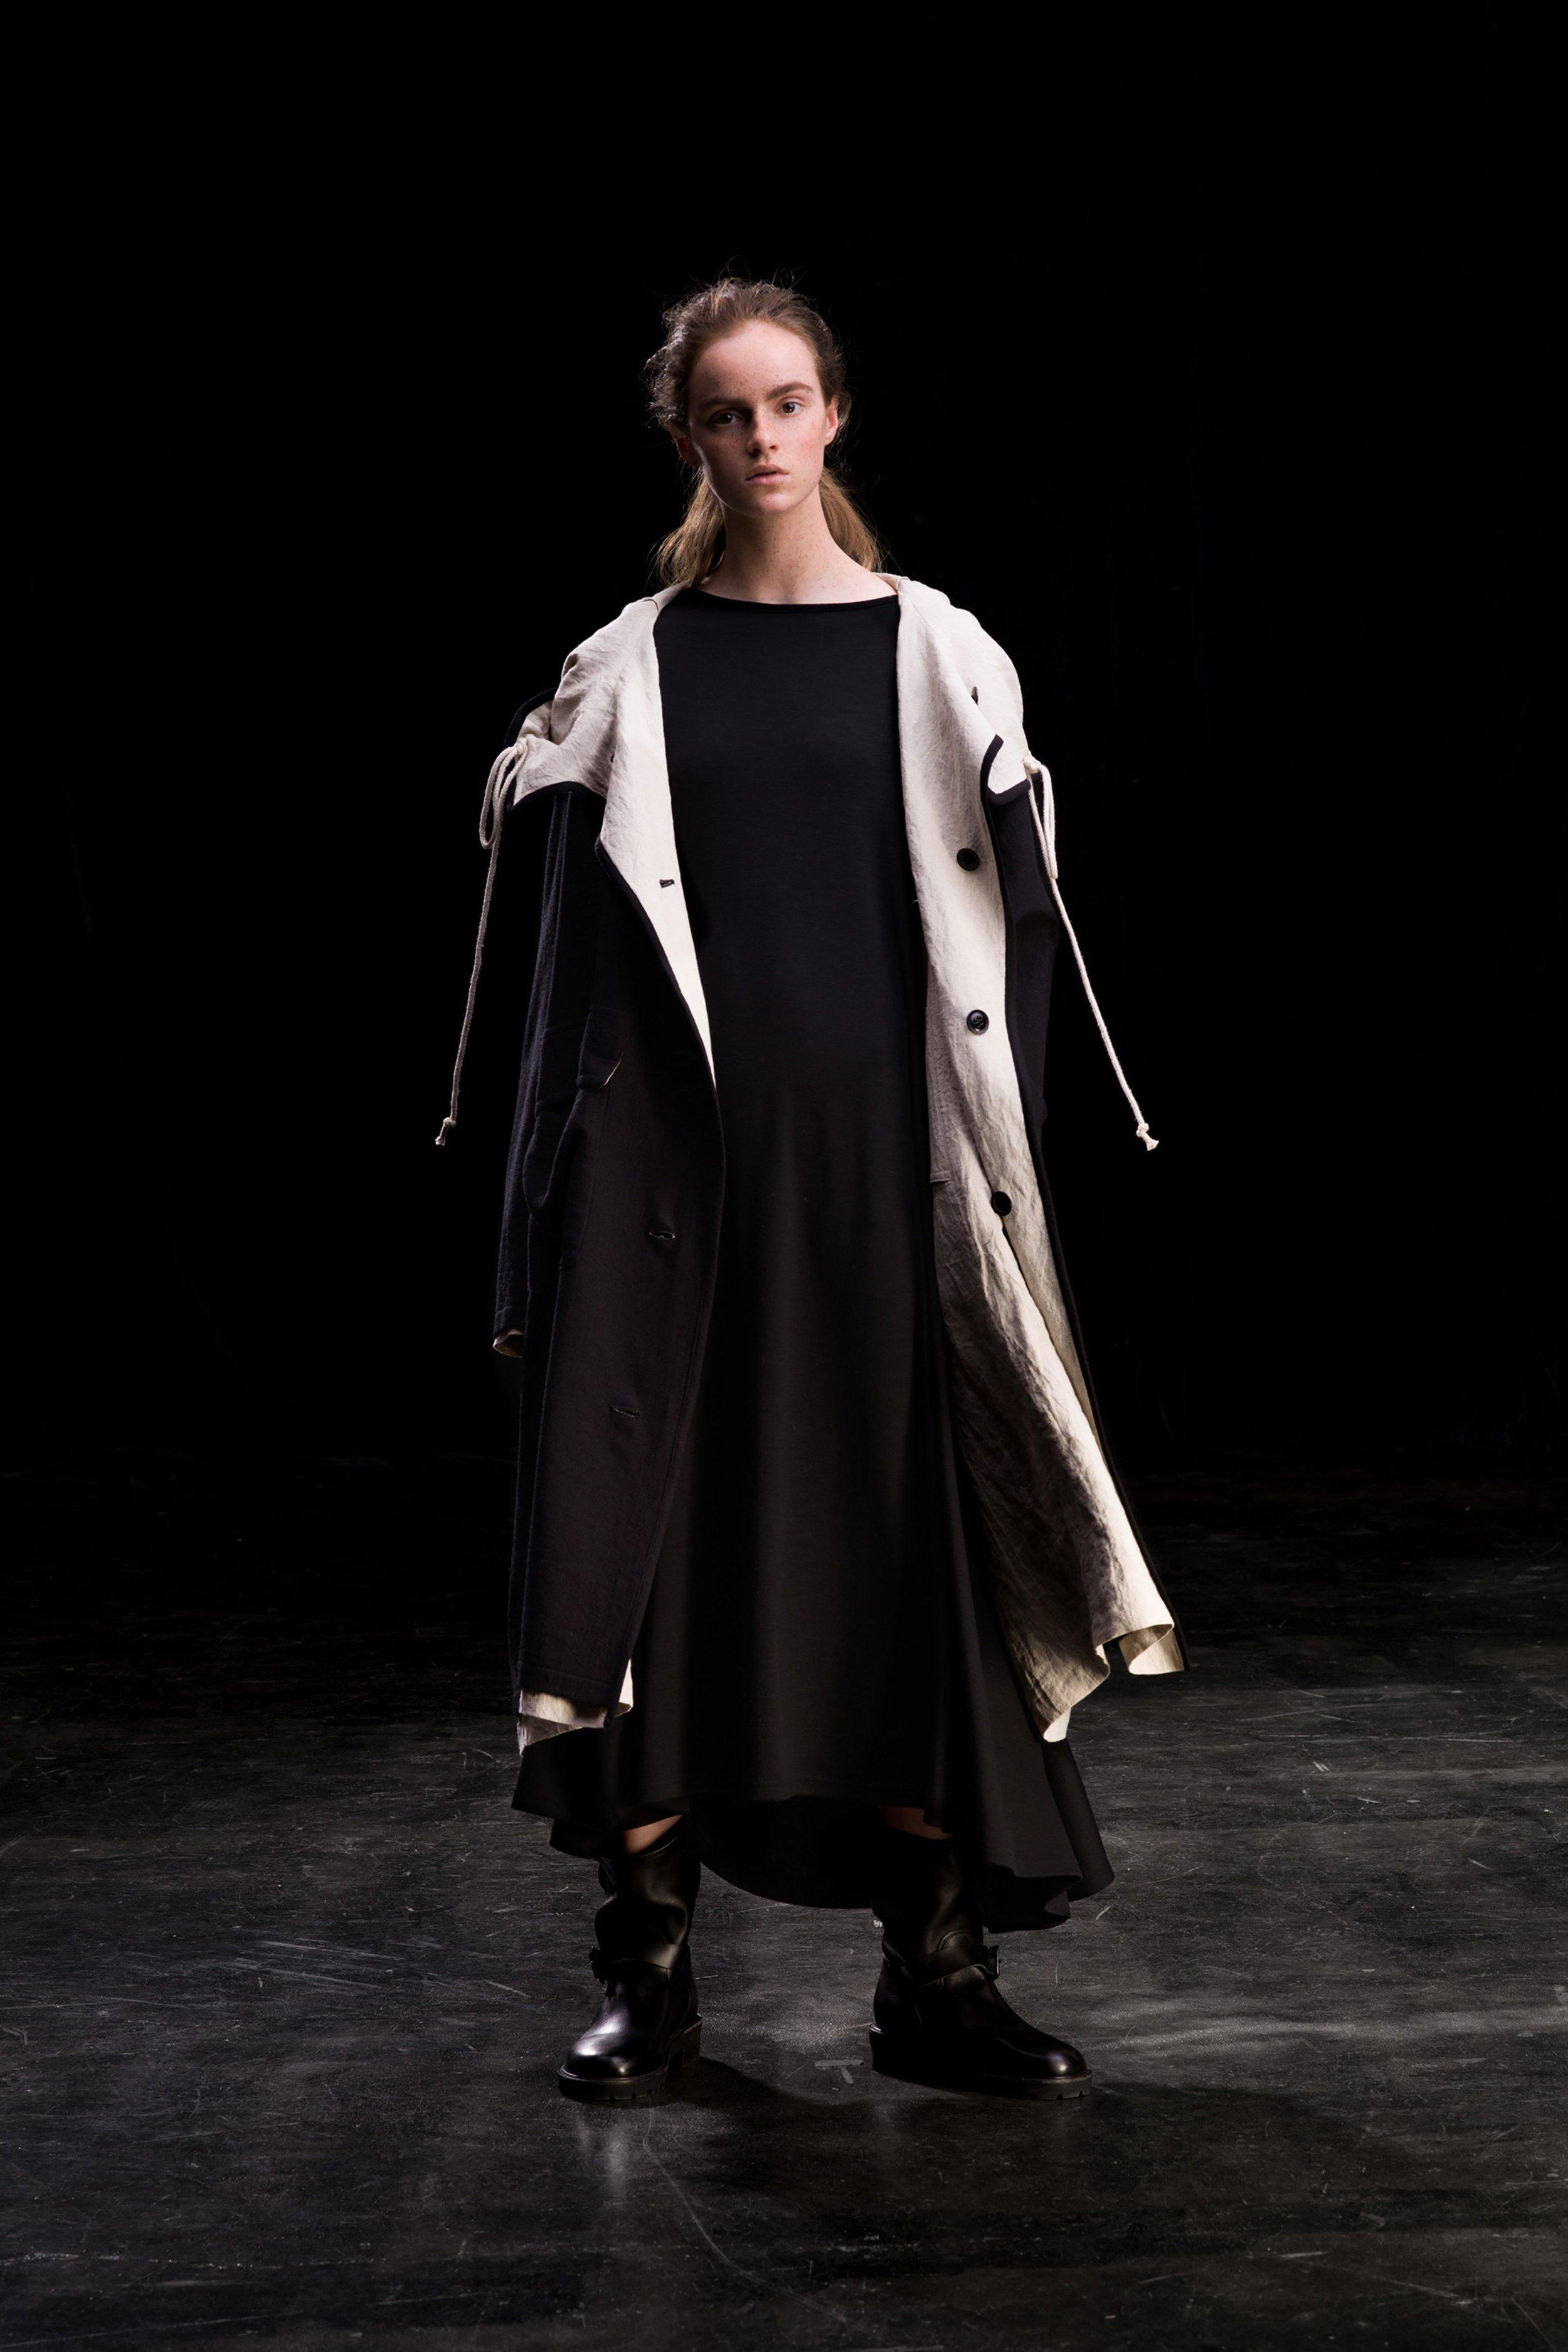 00008-Ys-Yohji-Yamamoto-FALL-19-Ready-To-Wear.jpg